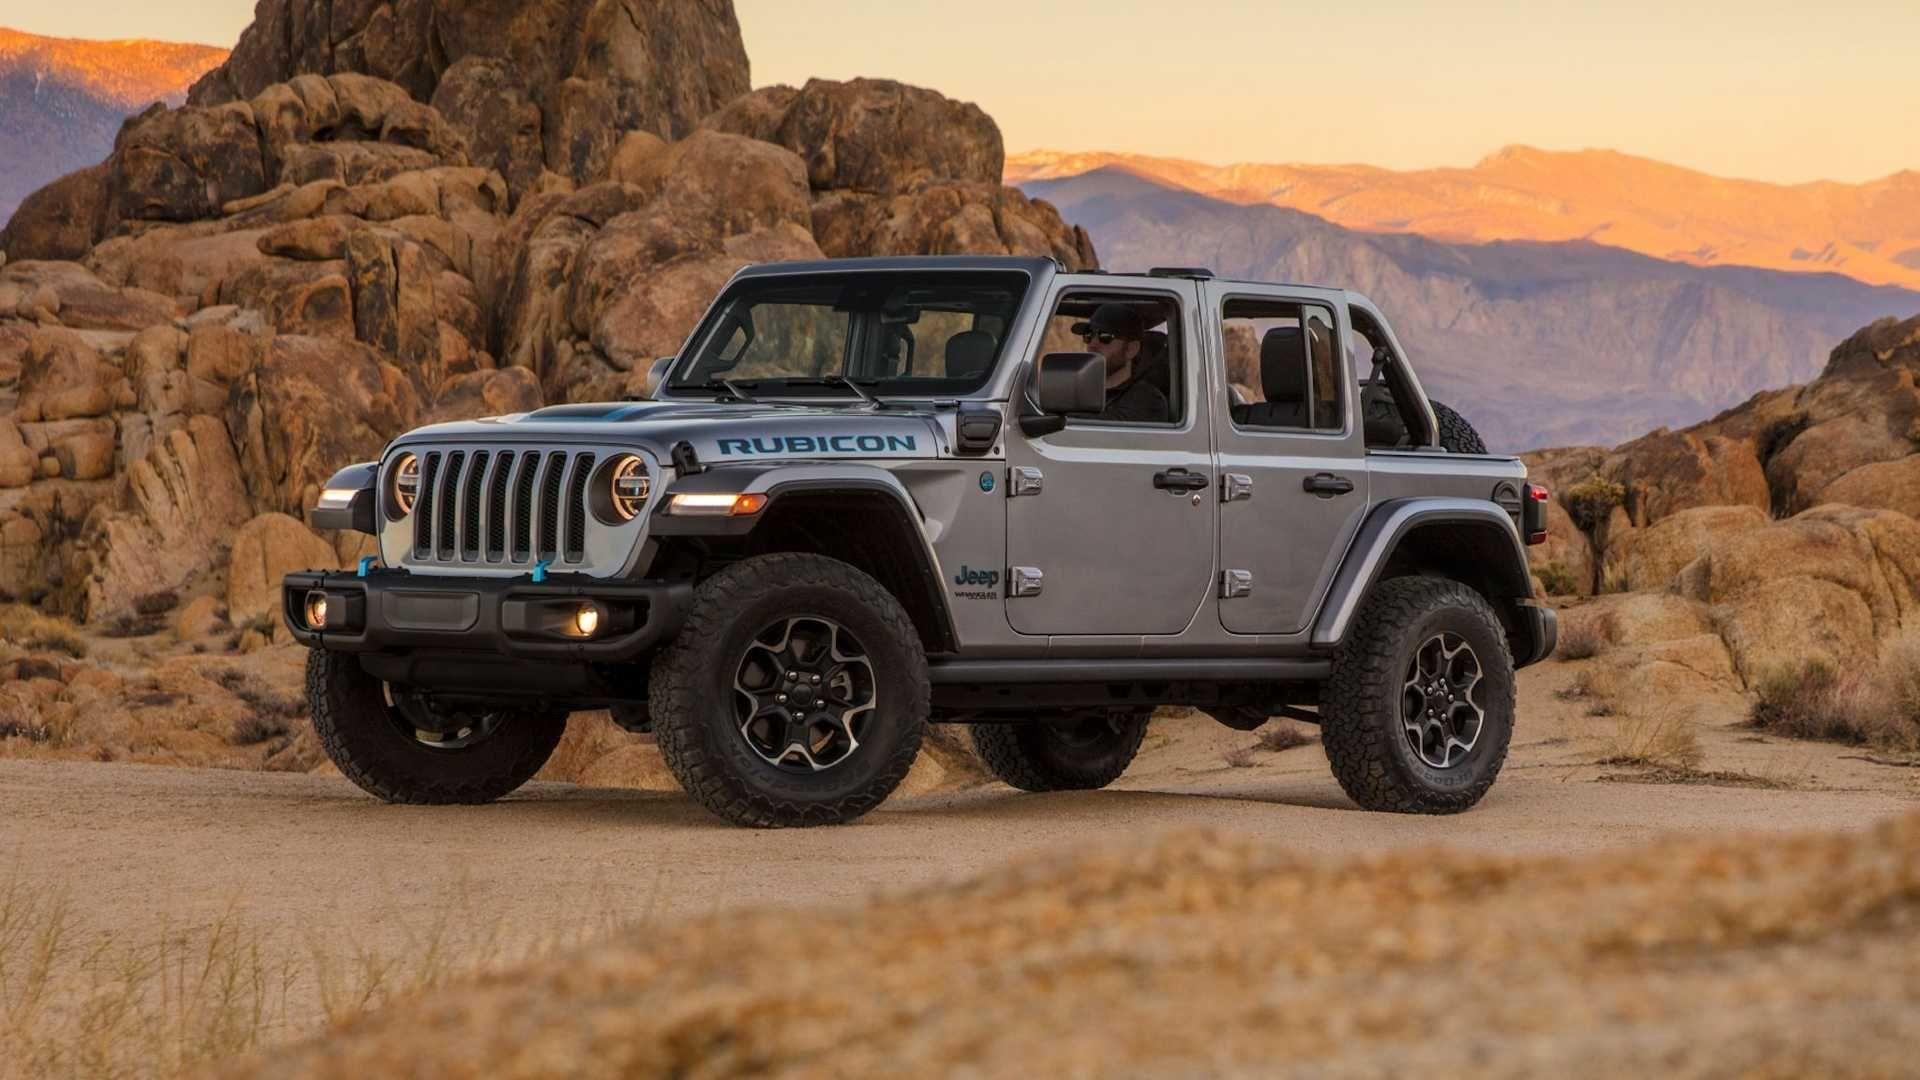 I legendarni Jeep Wrangler je dobio moderni plug-in hibridni pogon